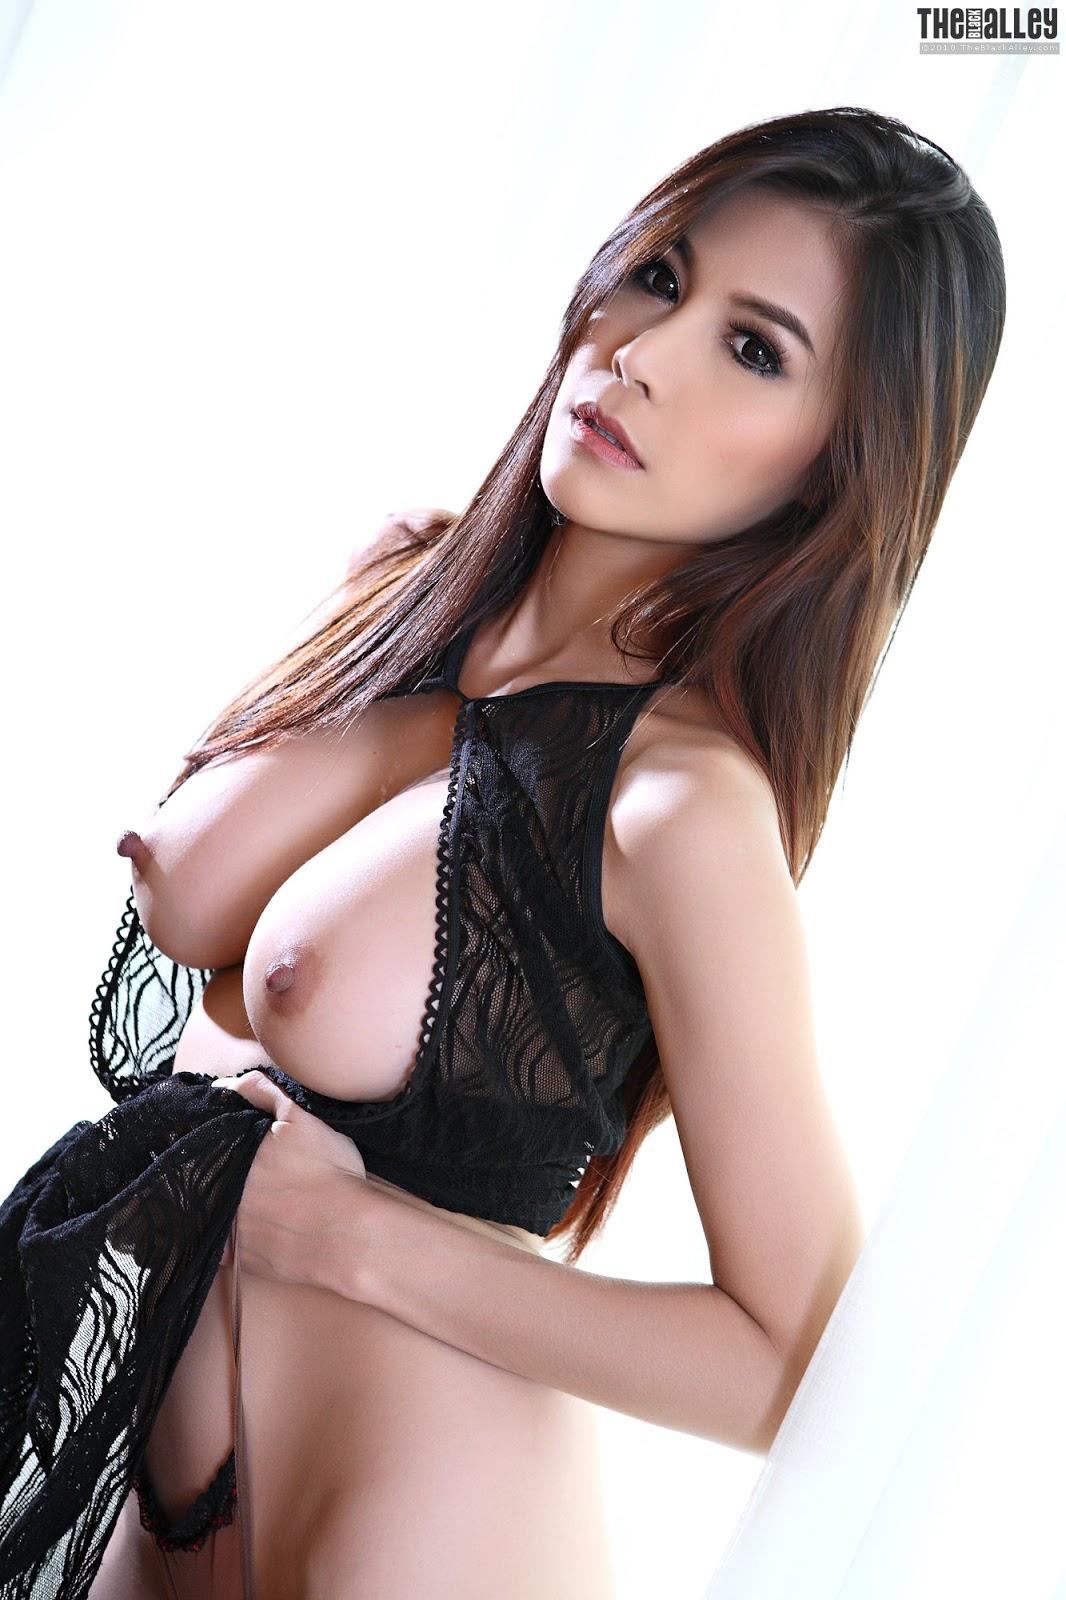 natalie-wang-50-021.jpg